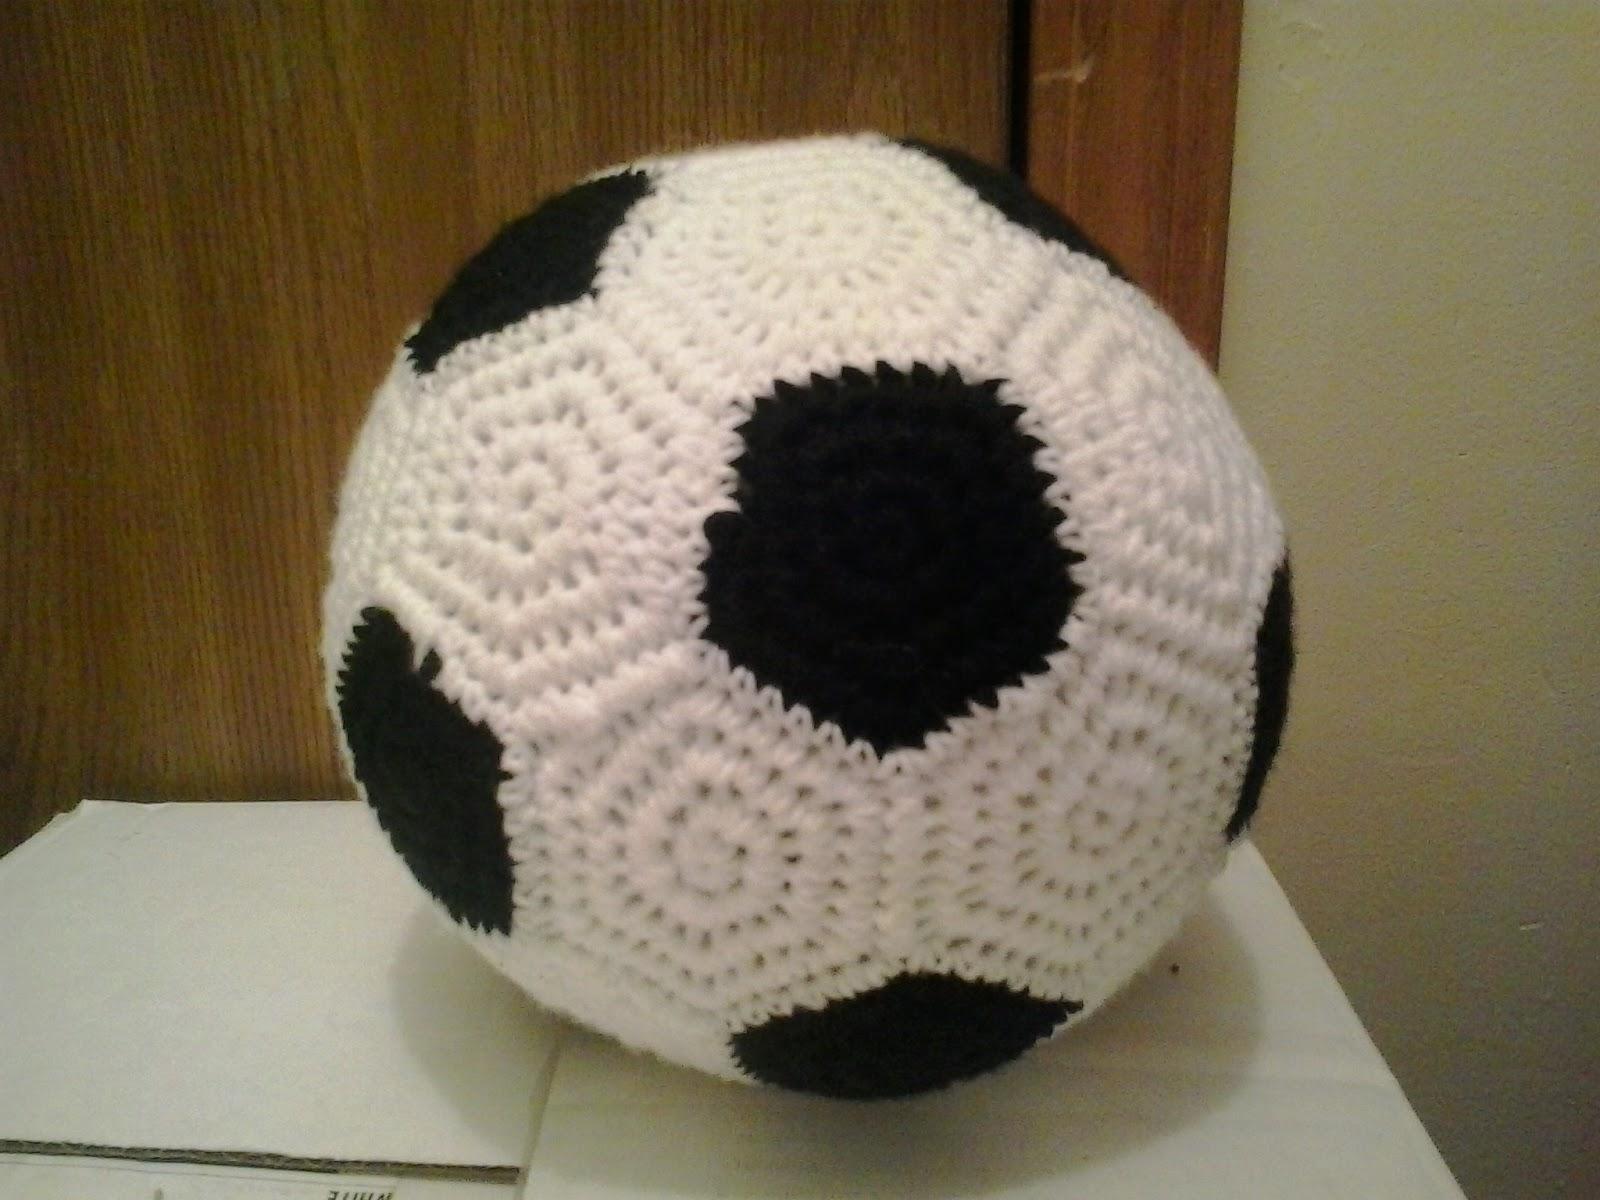 Crochet Fanatic: FULL-SIZED SOCCER BALL